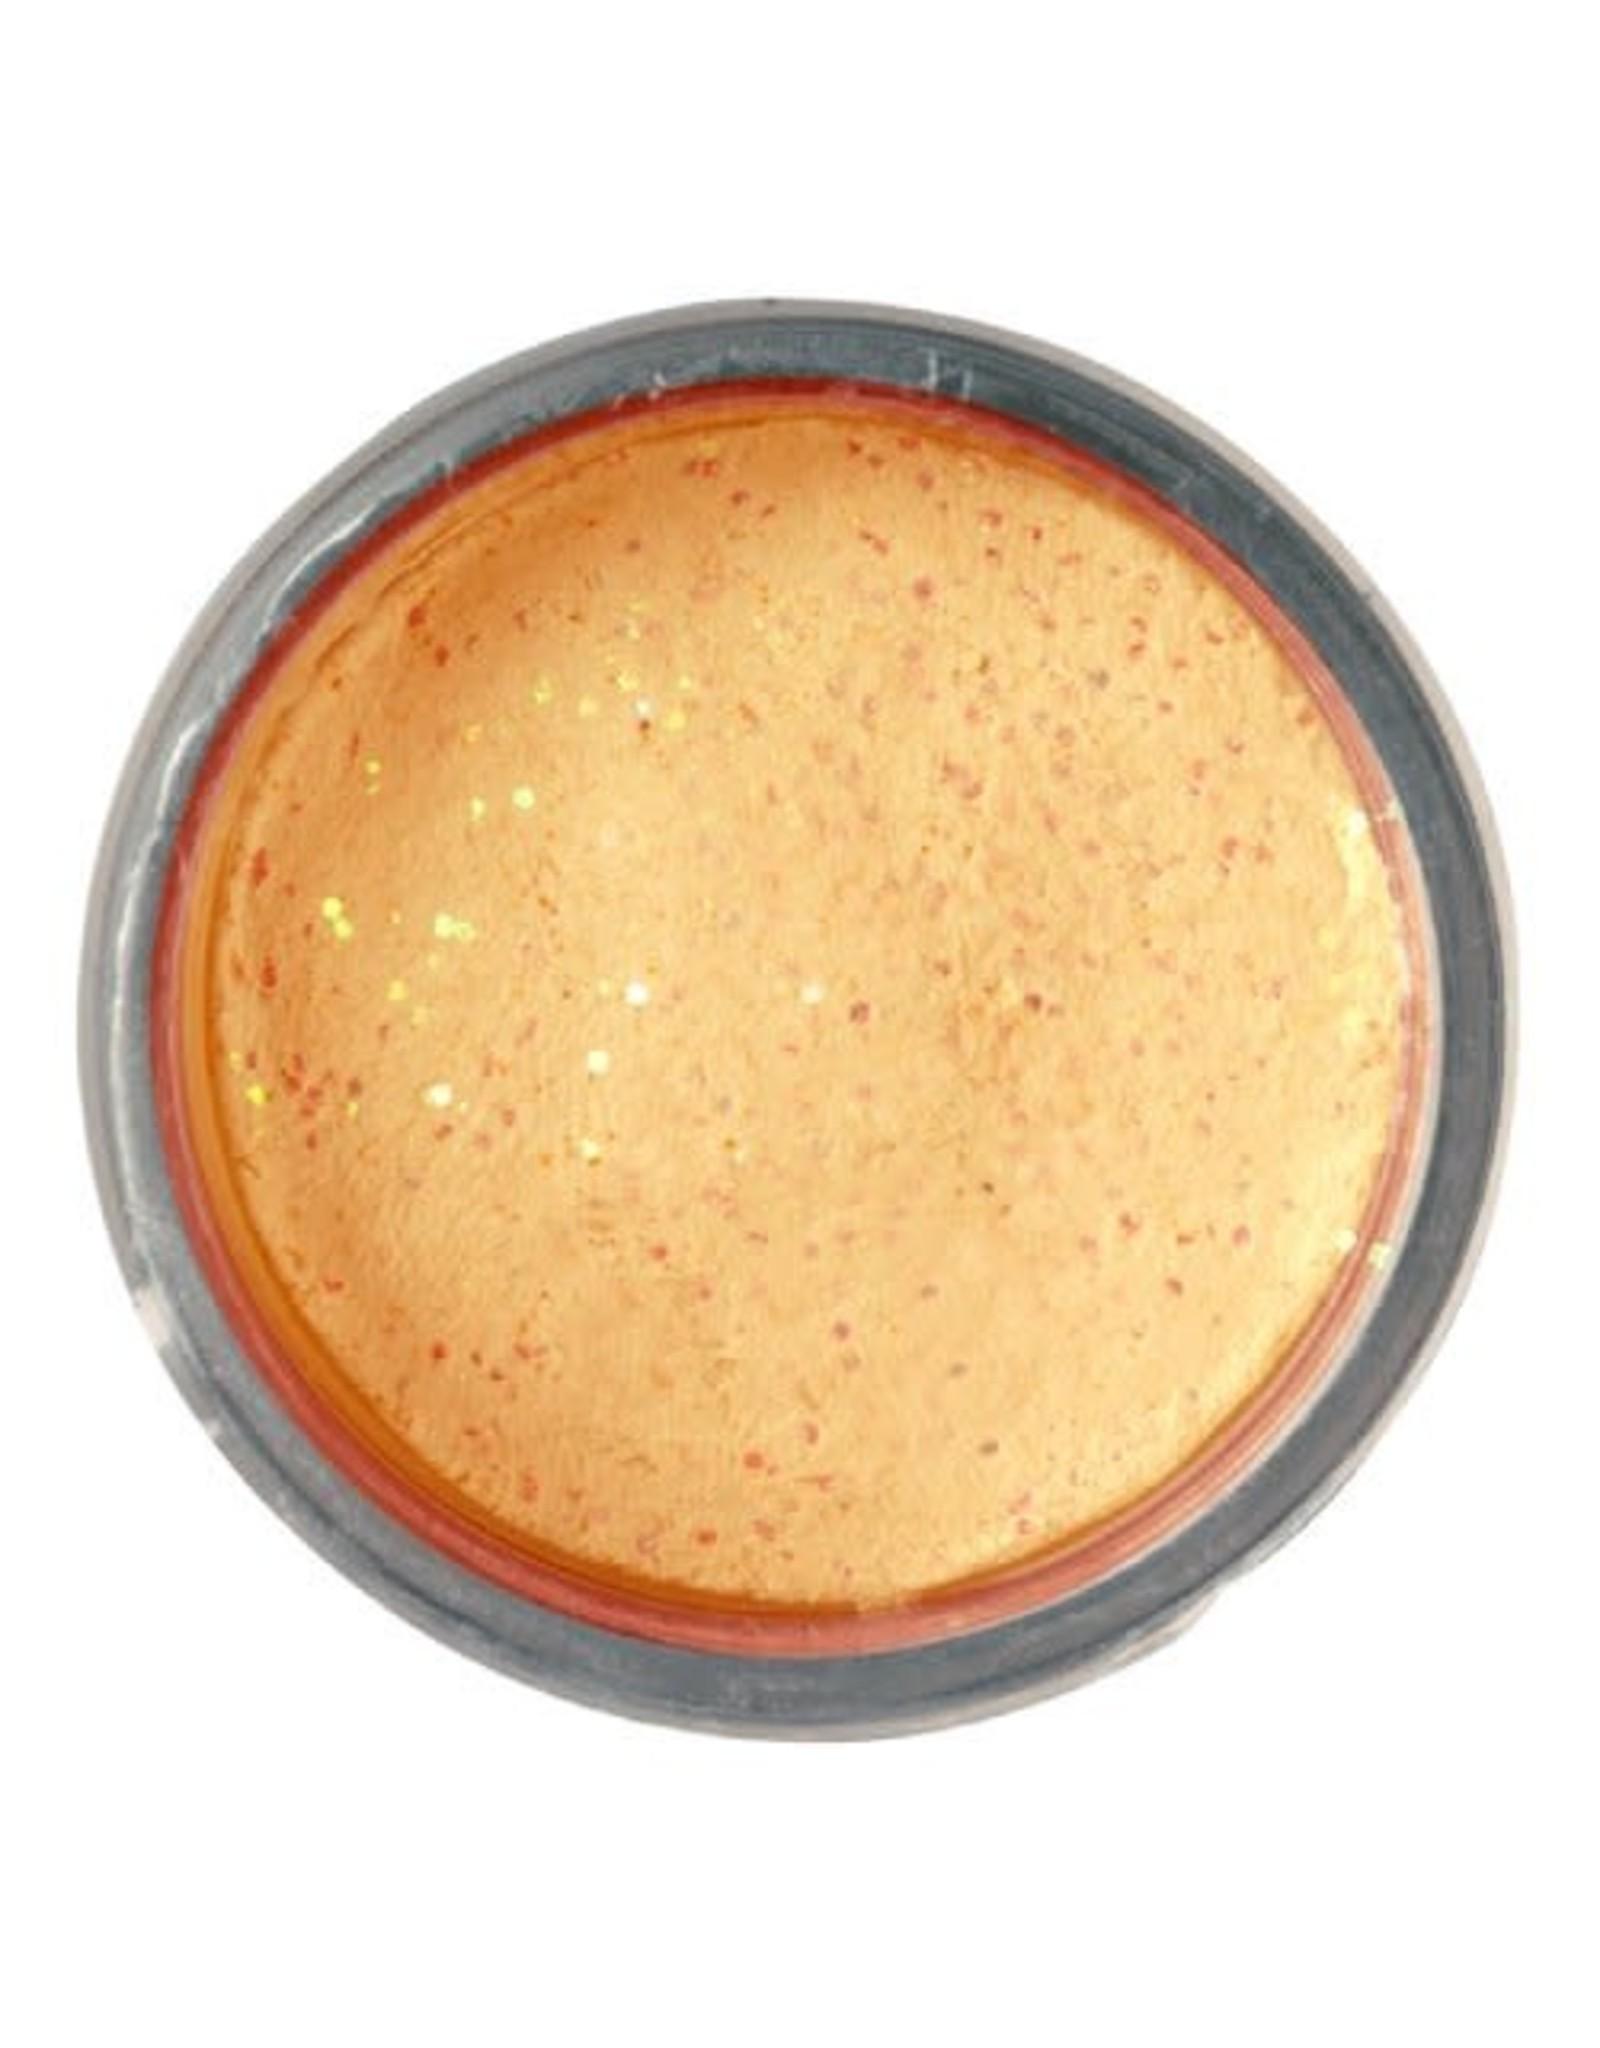 Berkley Berkley Gulp! Trout Bait - Garlic Chunky Cheese